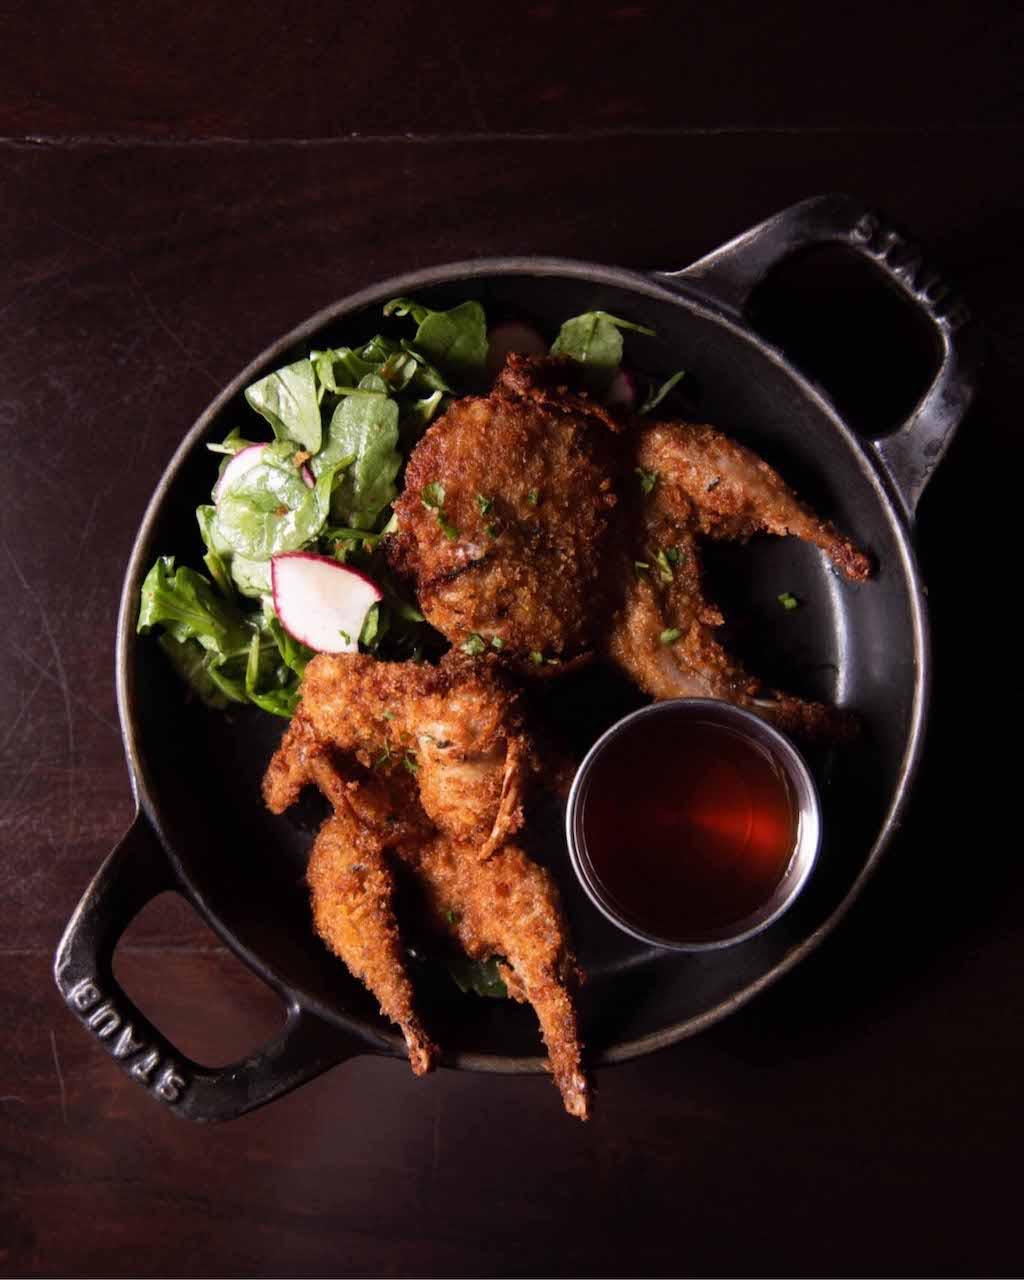 Eastern Standard restaurant food: fried quail